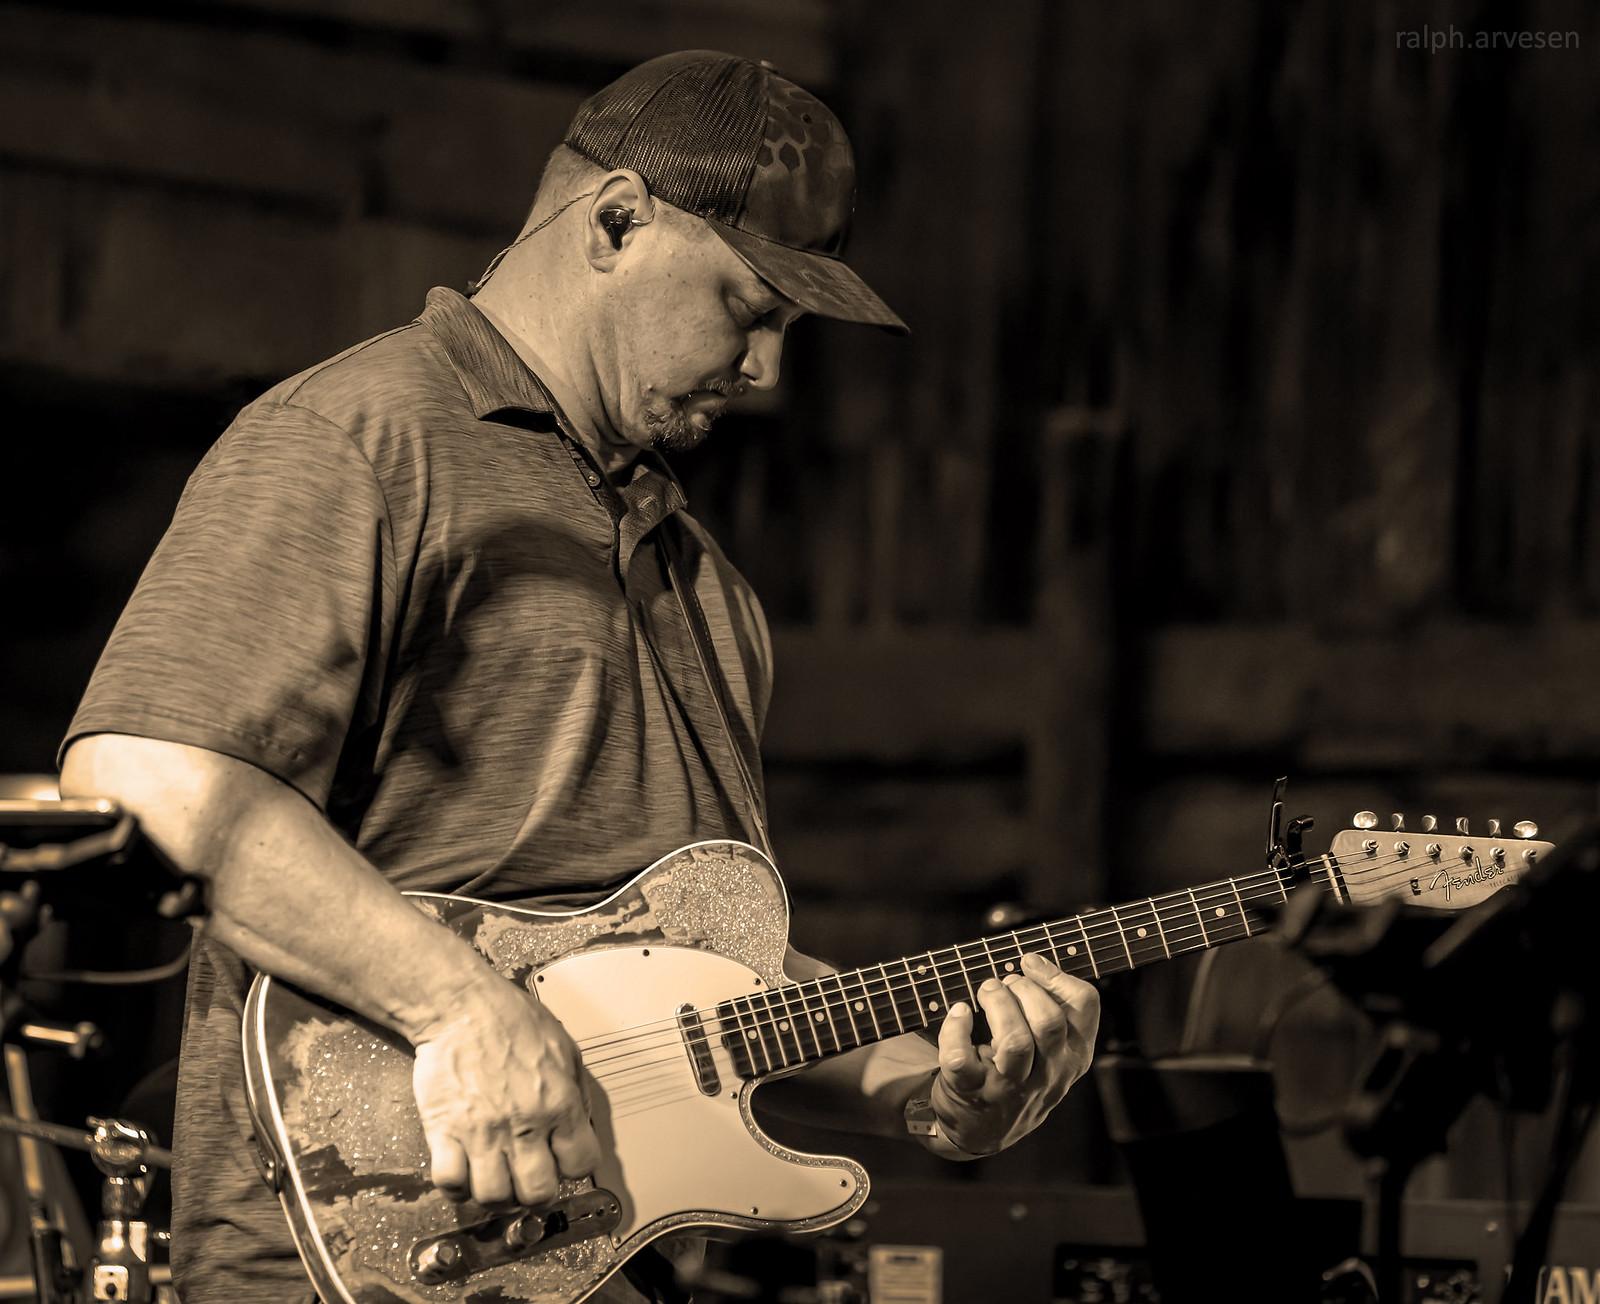 Tumble Dry Low | Texas Review | Ralph Arvesen